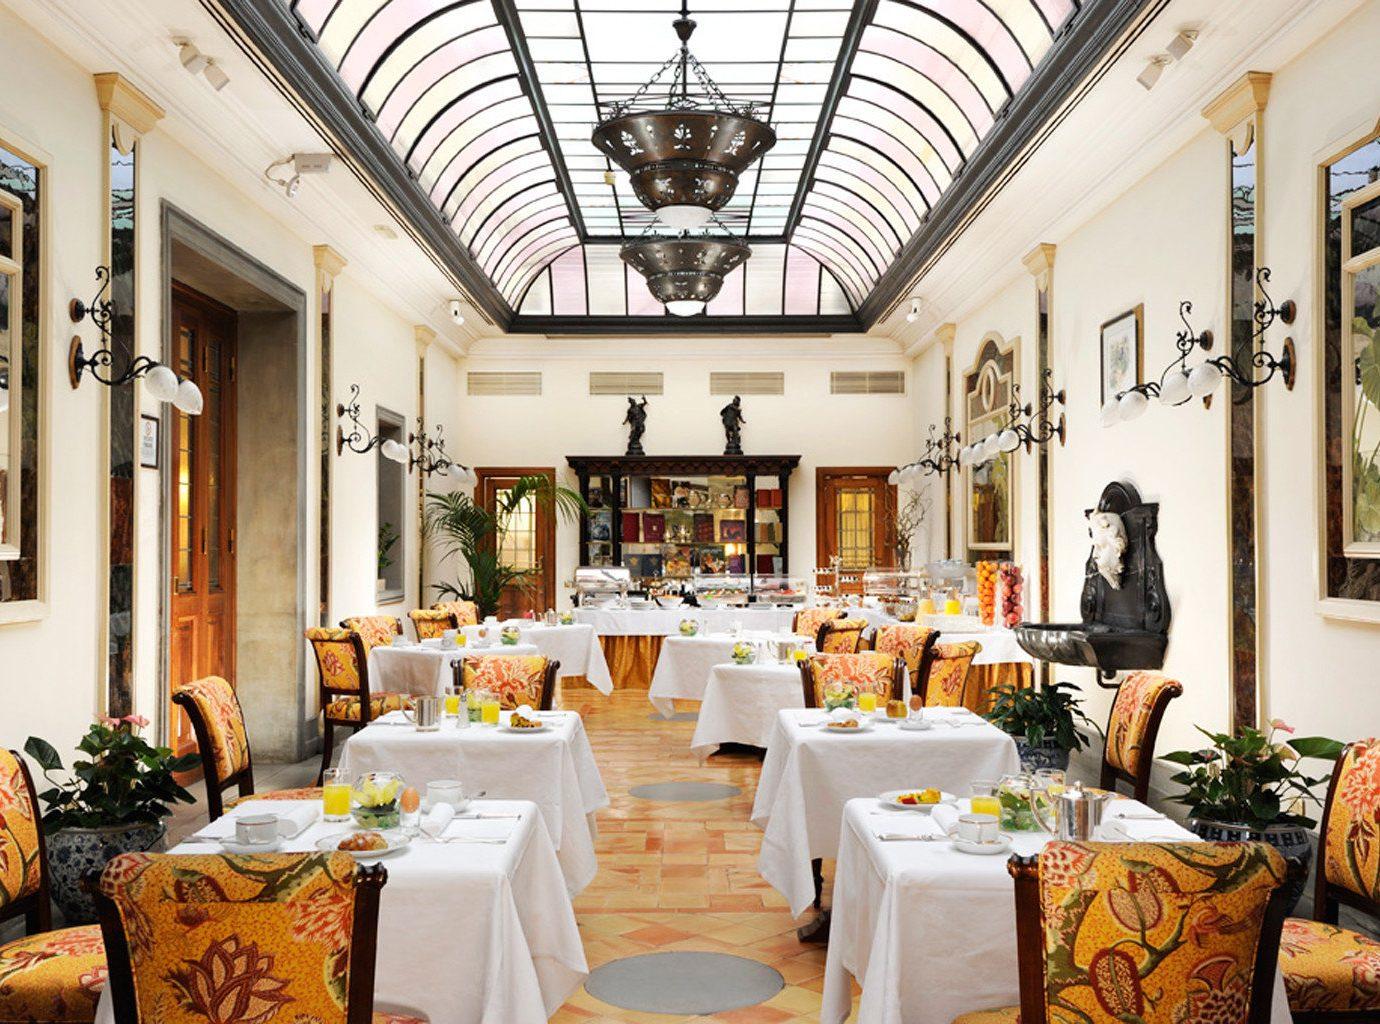 Boutique City Dining Drink Eat Historic Luxury Romantic property restaurant Resort home mansion palace living room function hall Villa hacienda